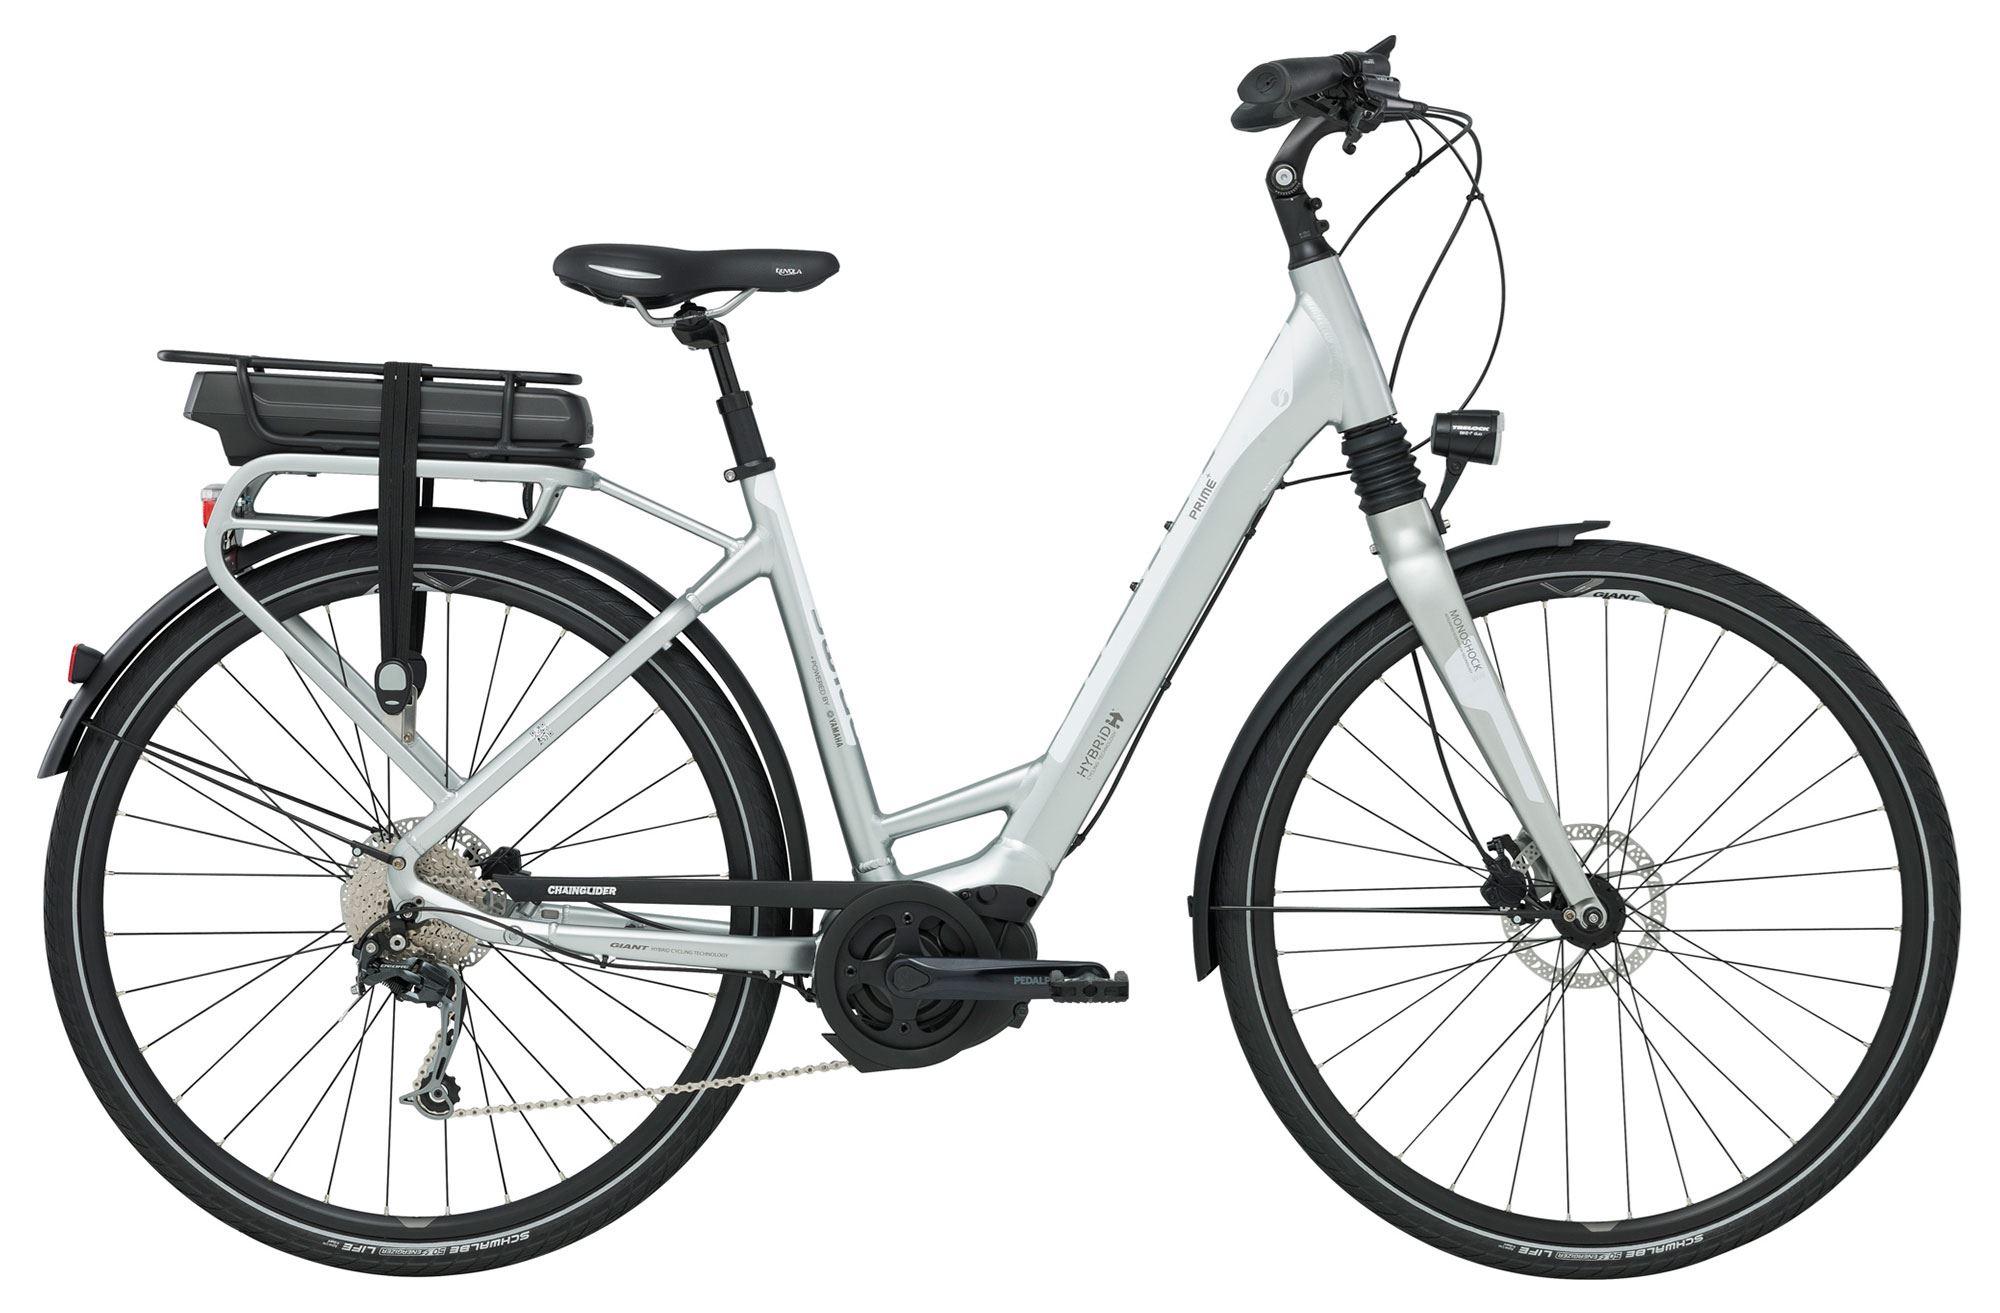 Giant Prime E 3 Ladies Electric Bike - H2 Gear